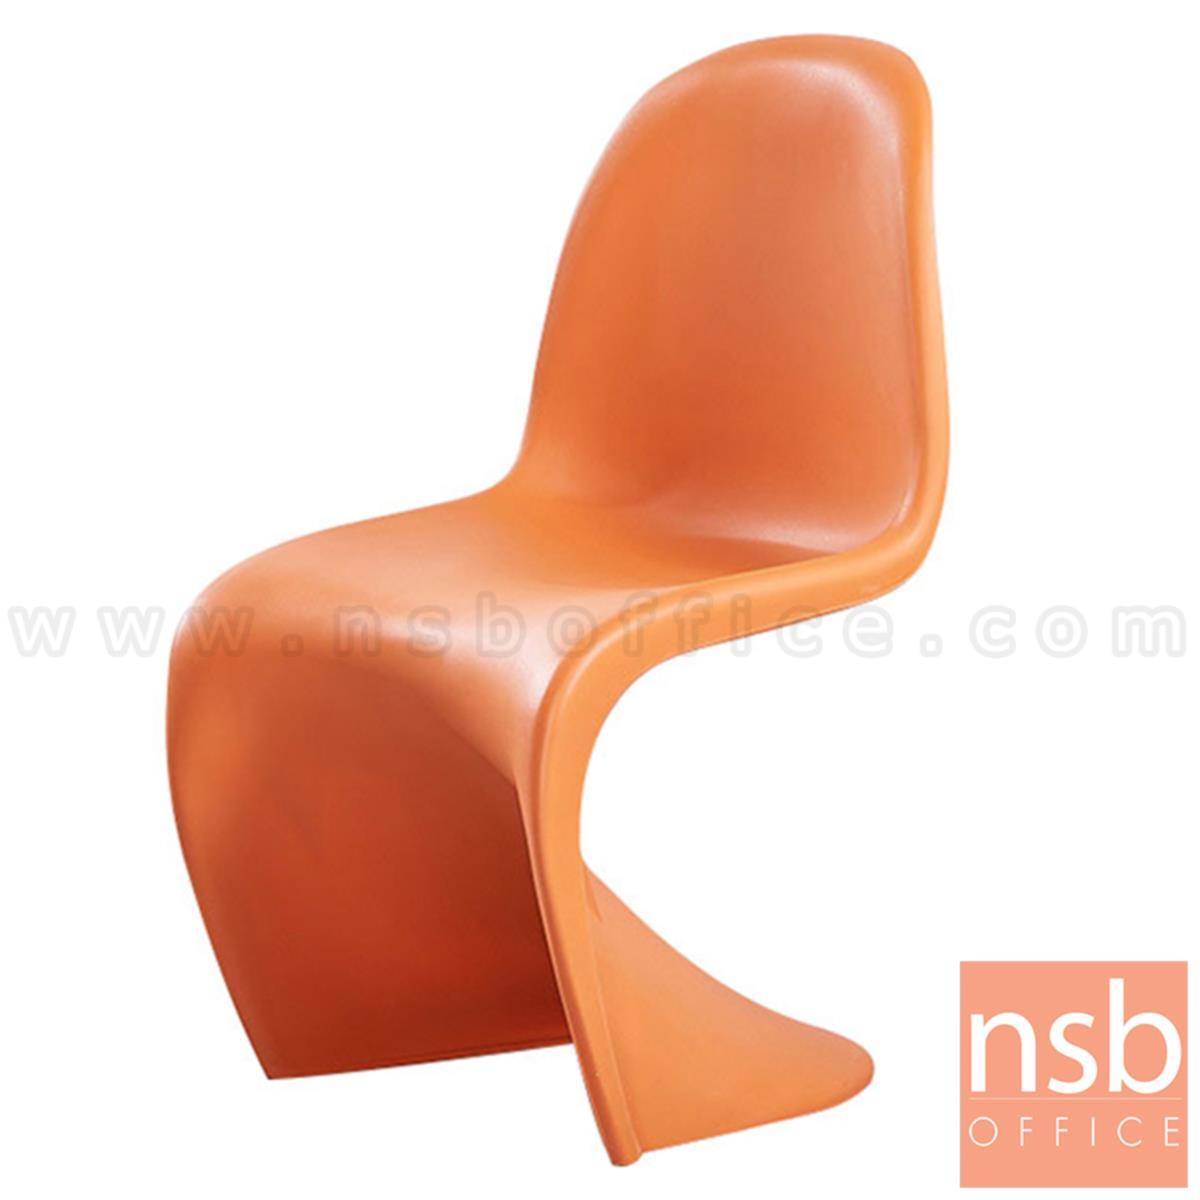 B29A040:เก้าอี้โมเดิร์นพลาสติก(ABS) รุ่น PP9053 ขนาด 49W cm.